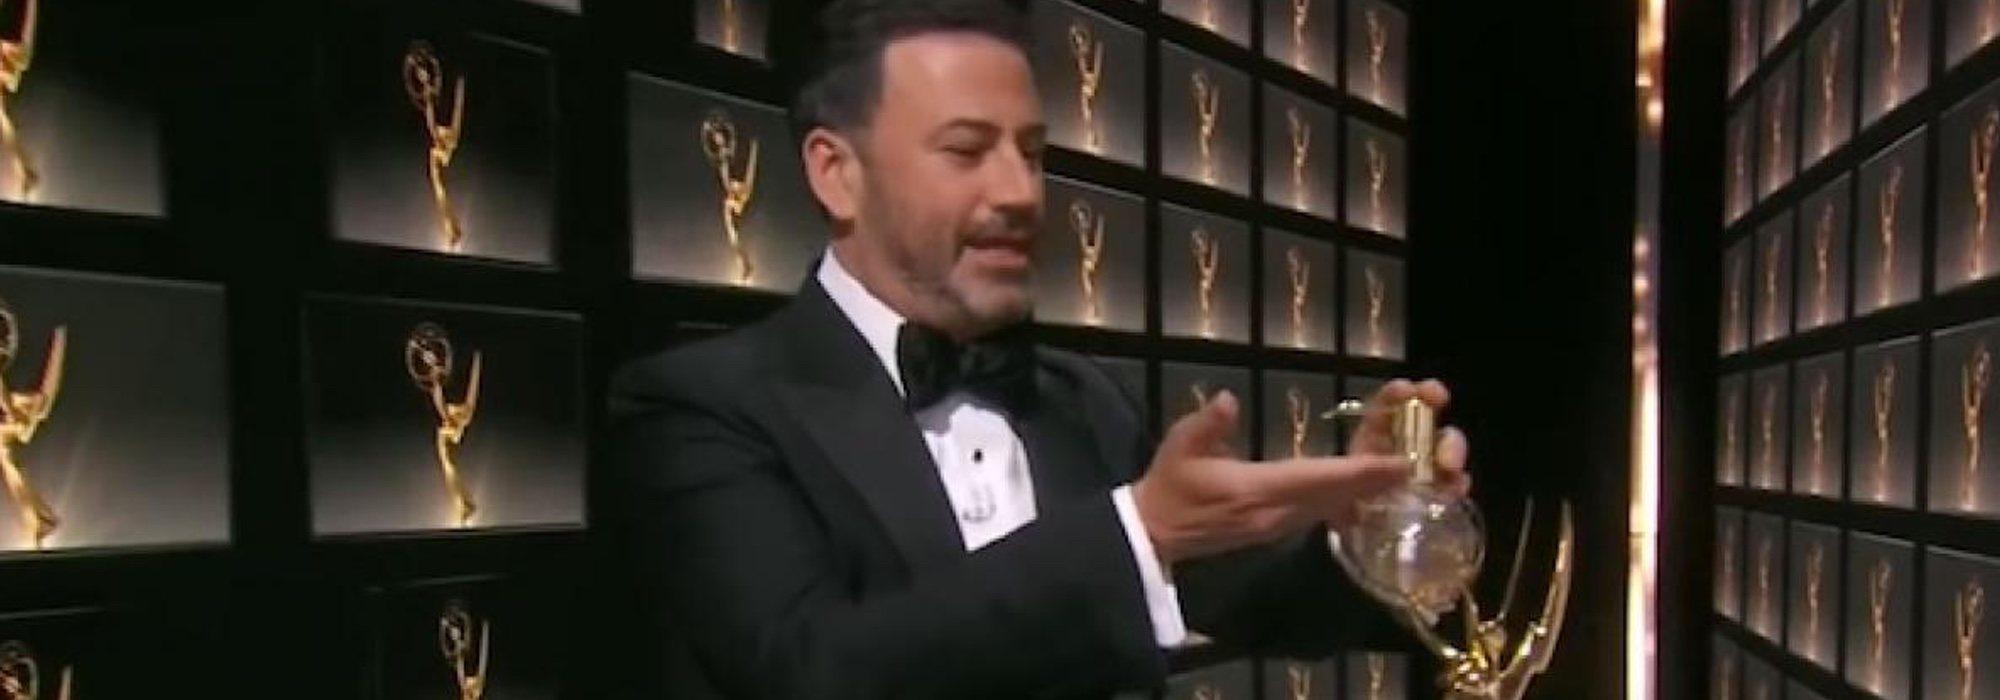 72th Primetime Emmy Awards